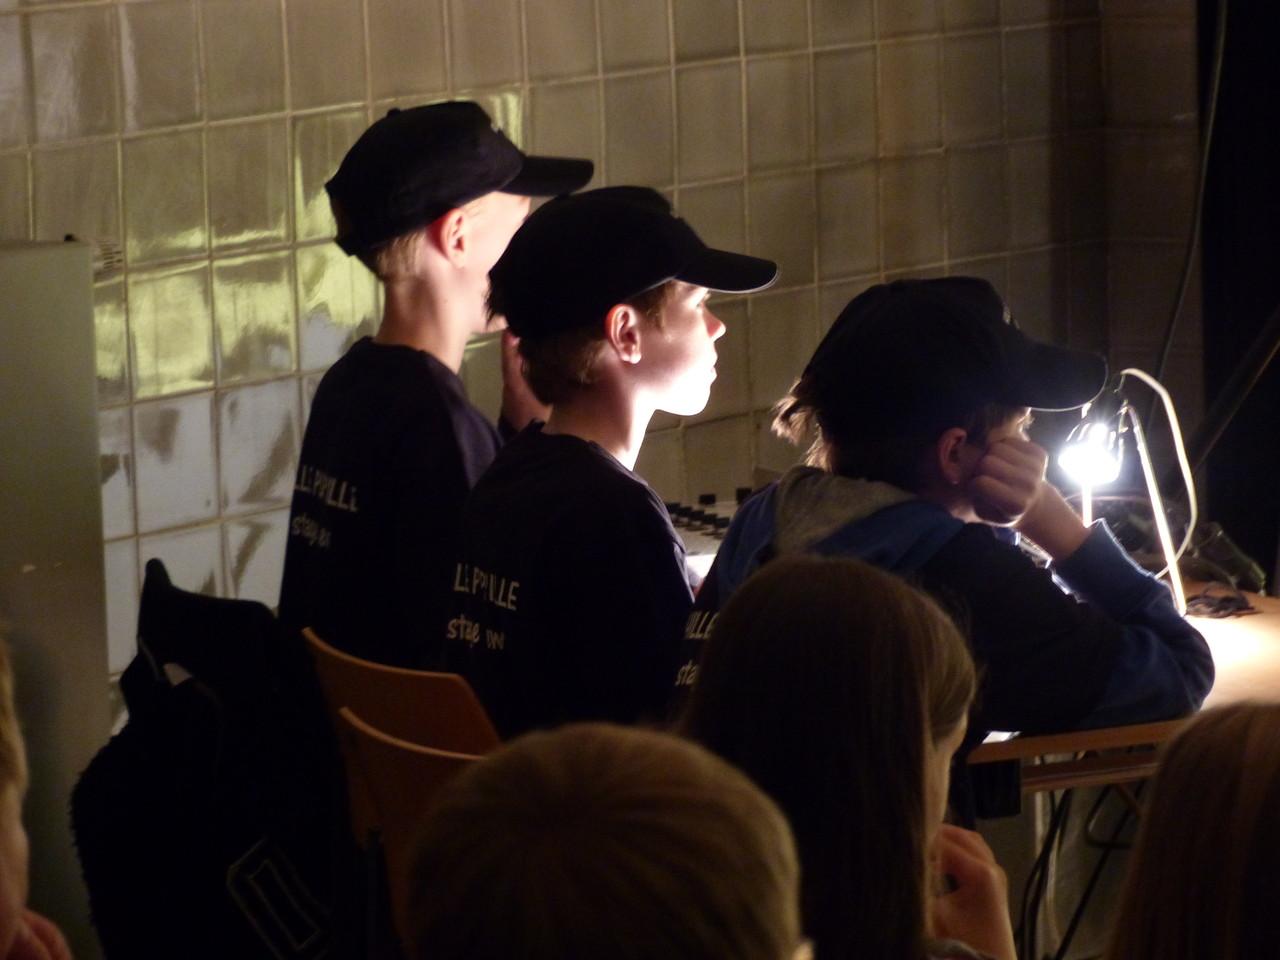 Lichttechnik live, Foto:Falley